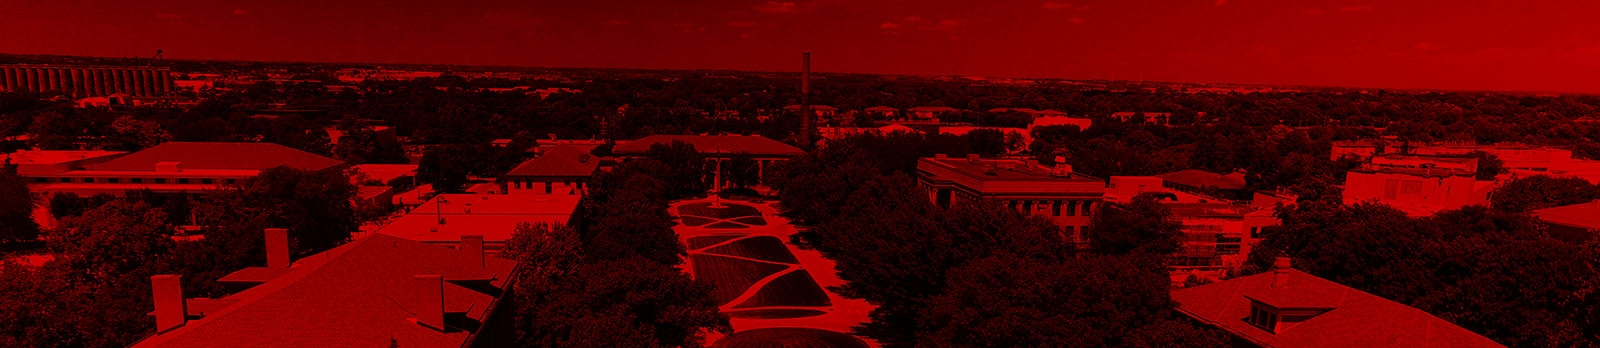 East Campus Mall University of Nebraska-Lincoln